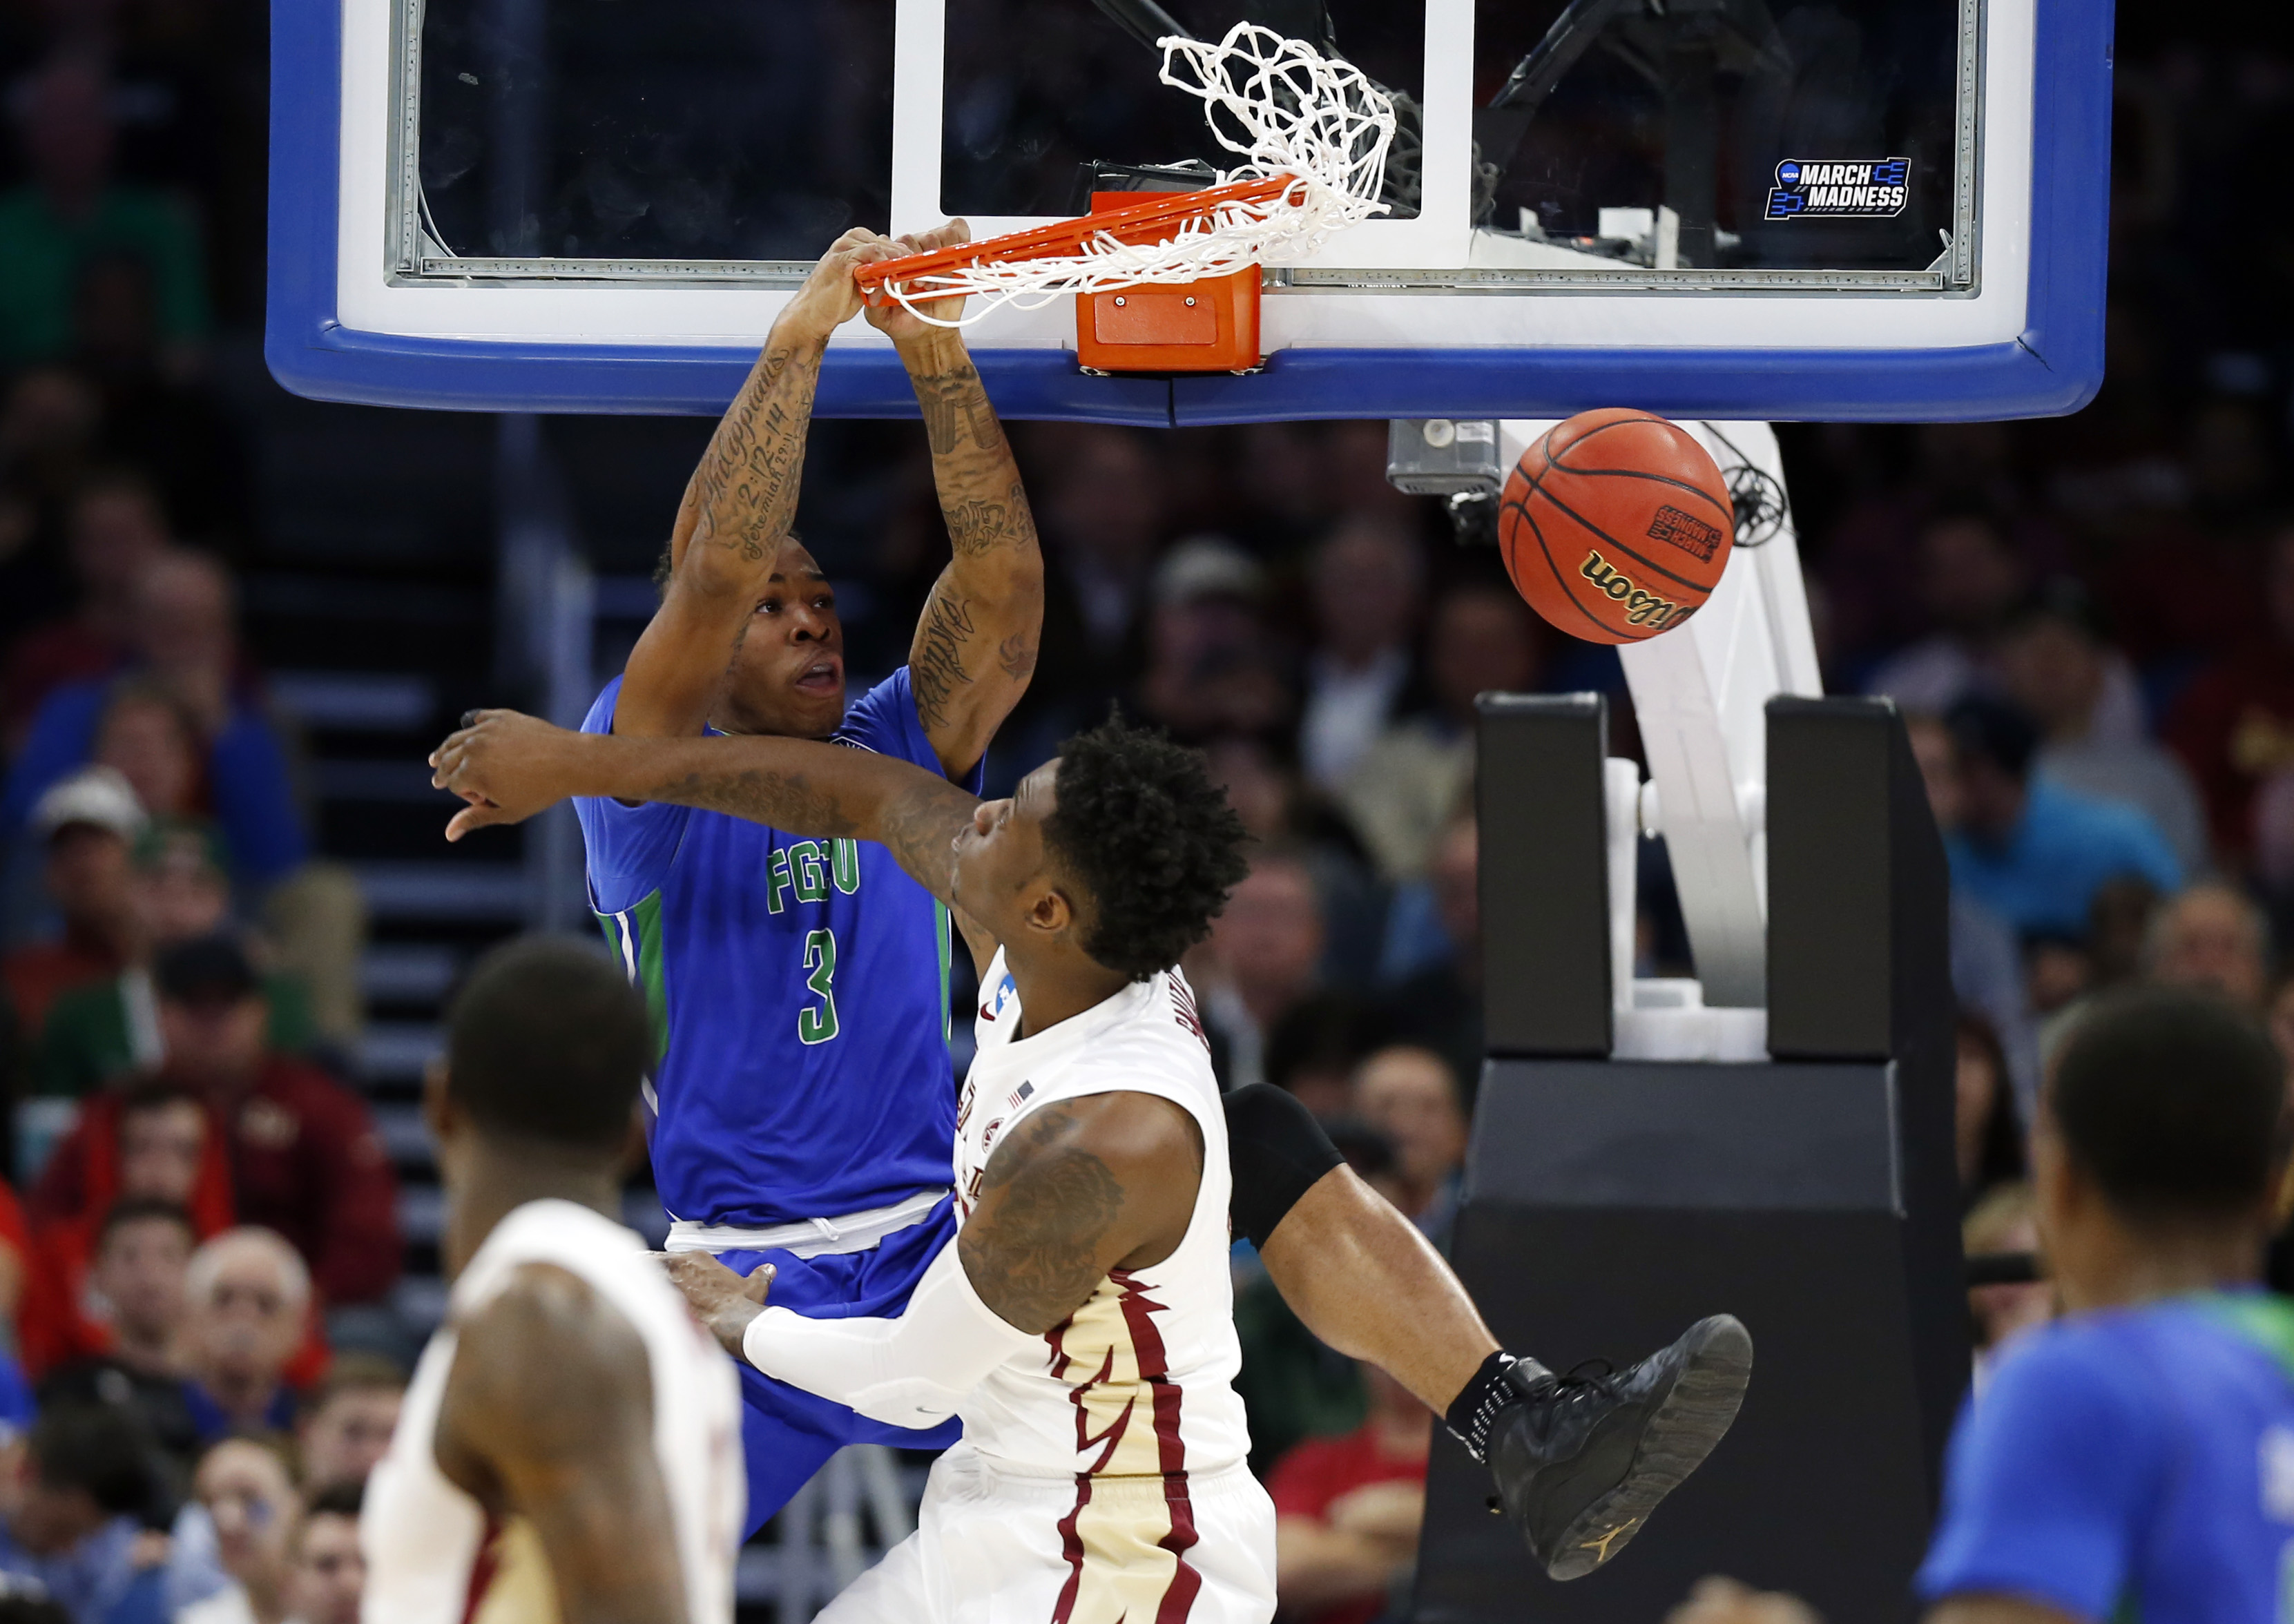 9948565-ncaa-basketball-ncaa-tournament-first-round-florida-state-vs-florida-gulf-coast